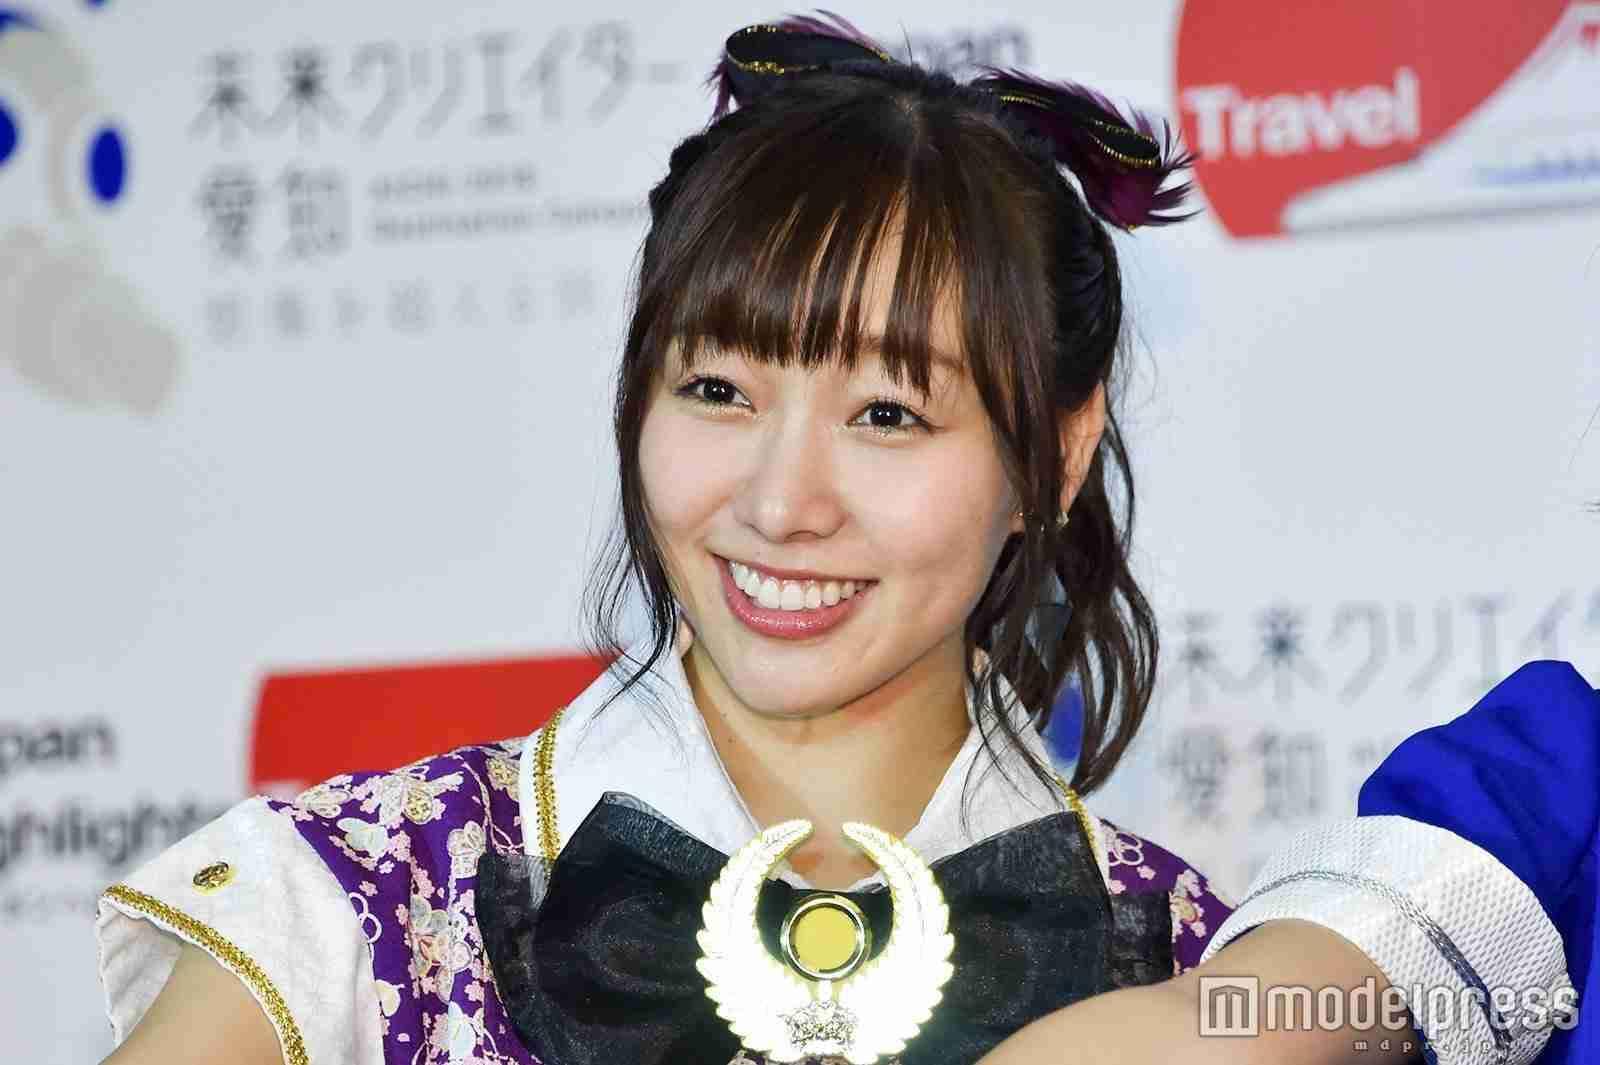 SKE48須田亜香里、趣味は整形パトロール「テレビに出てる方は多い」 整形タレントも告白